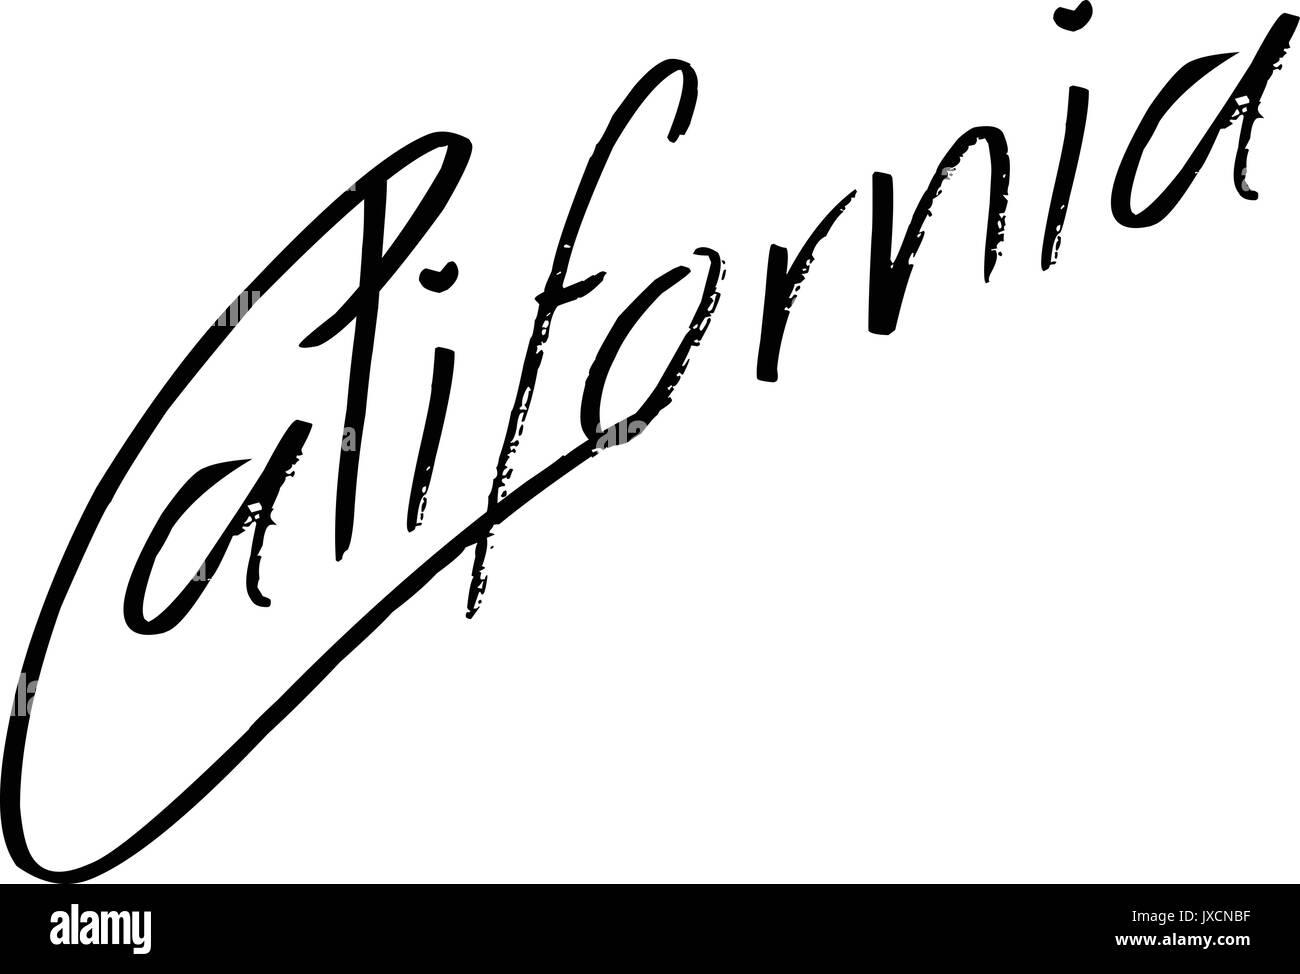 California text sign illustration - Stock Image